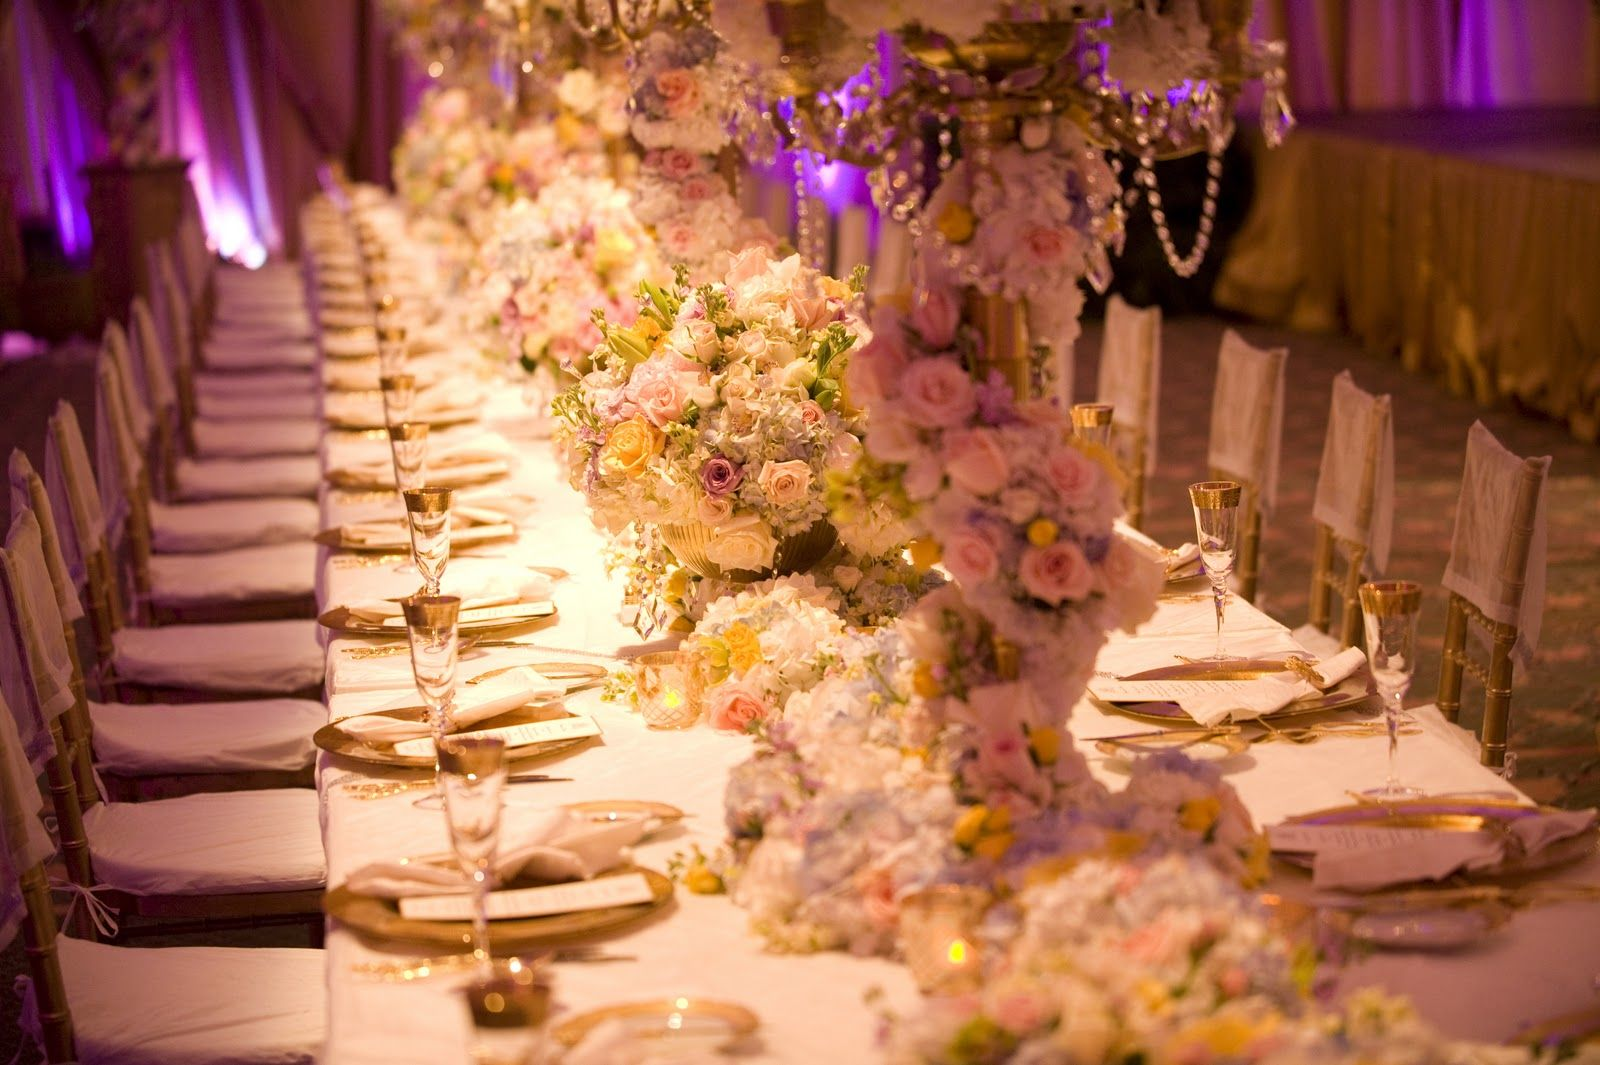 a Royal Reception table at Disney Fairytale Weddings- amazing    see   www.disneyweddings.go.com  Google Image Result for http://3.bp.blogspot.com/_W6vnNBeX1BQ/TJ55B_lbsjI/AAAAAAAAAEo/Ph9wD-PzQEM/s1600/DisneyWeddingsUpCloseTableShot.JPG